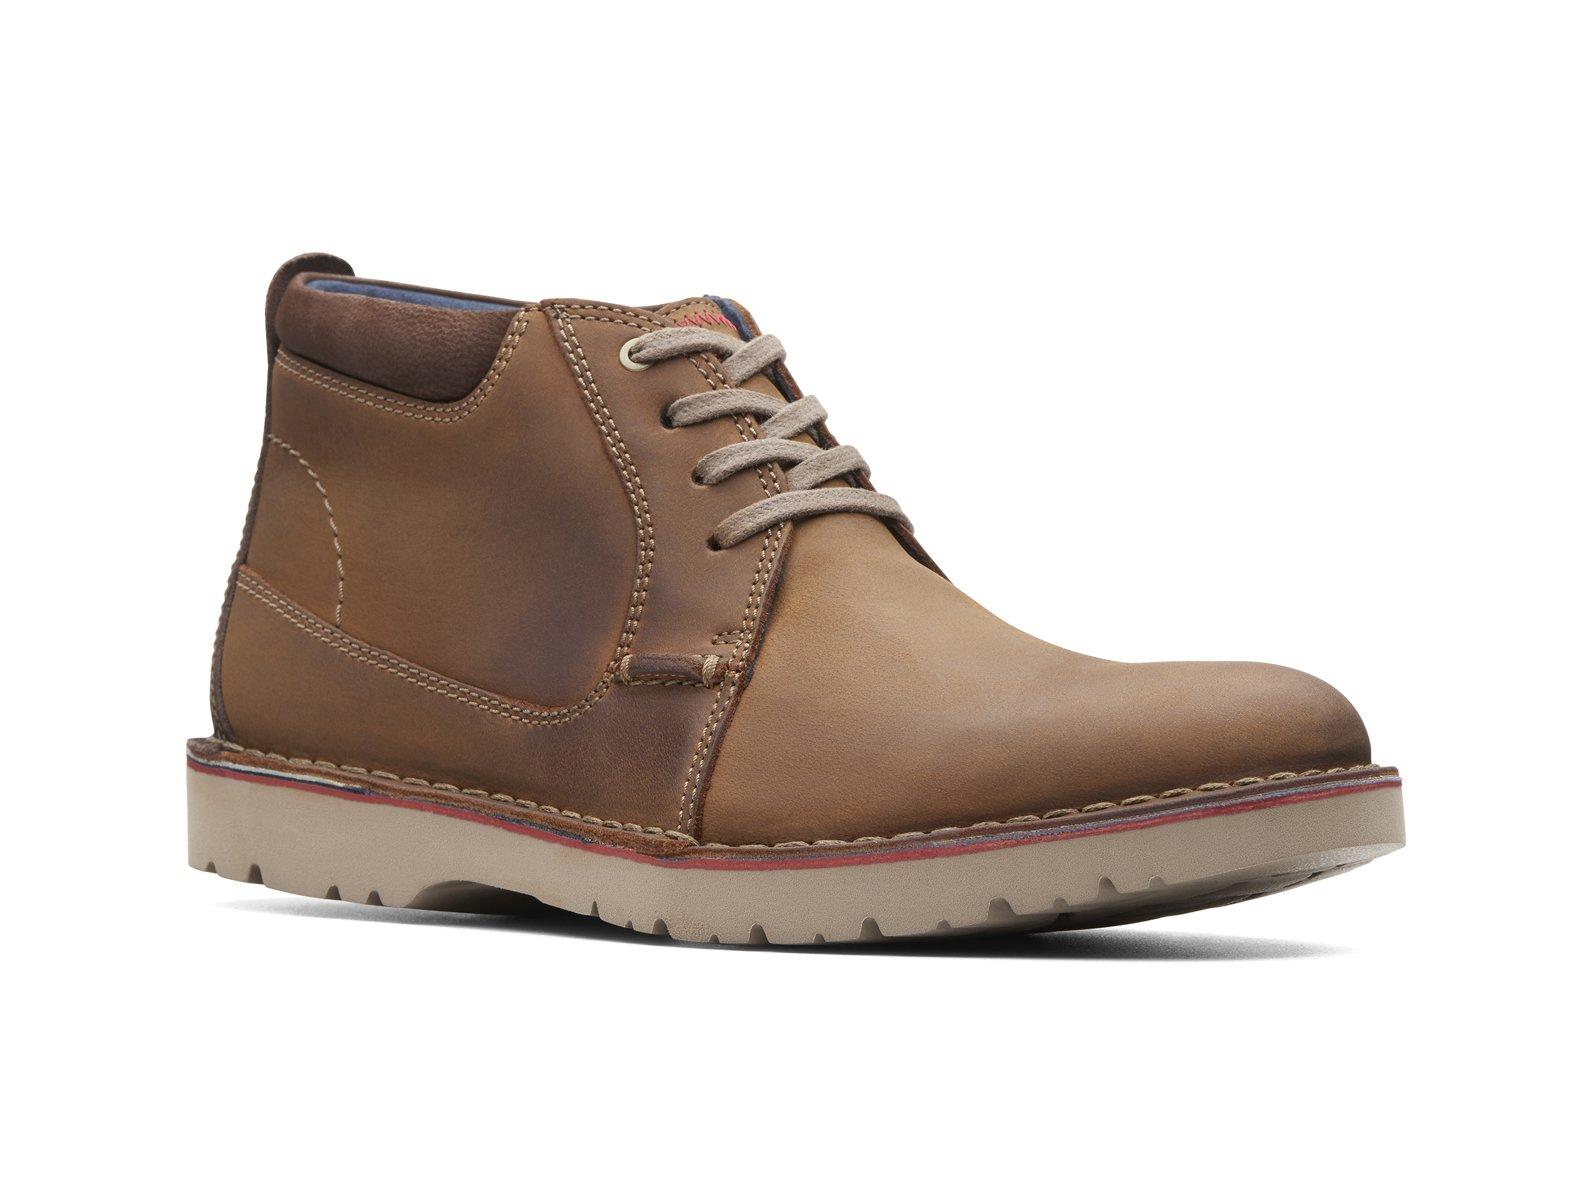 Clarks Vargo Mid Chukka Boots Dark Tan Leather Shoes Men's S